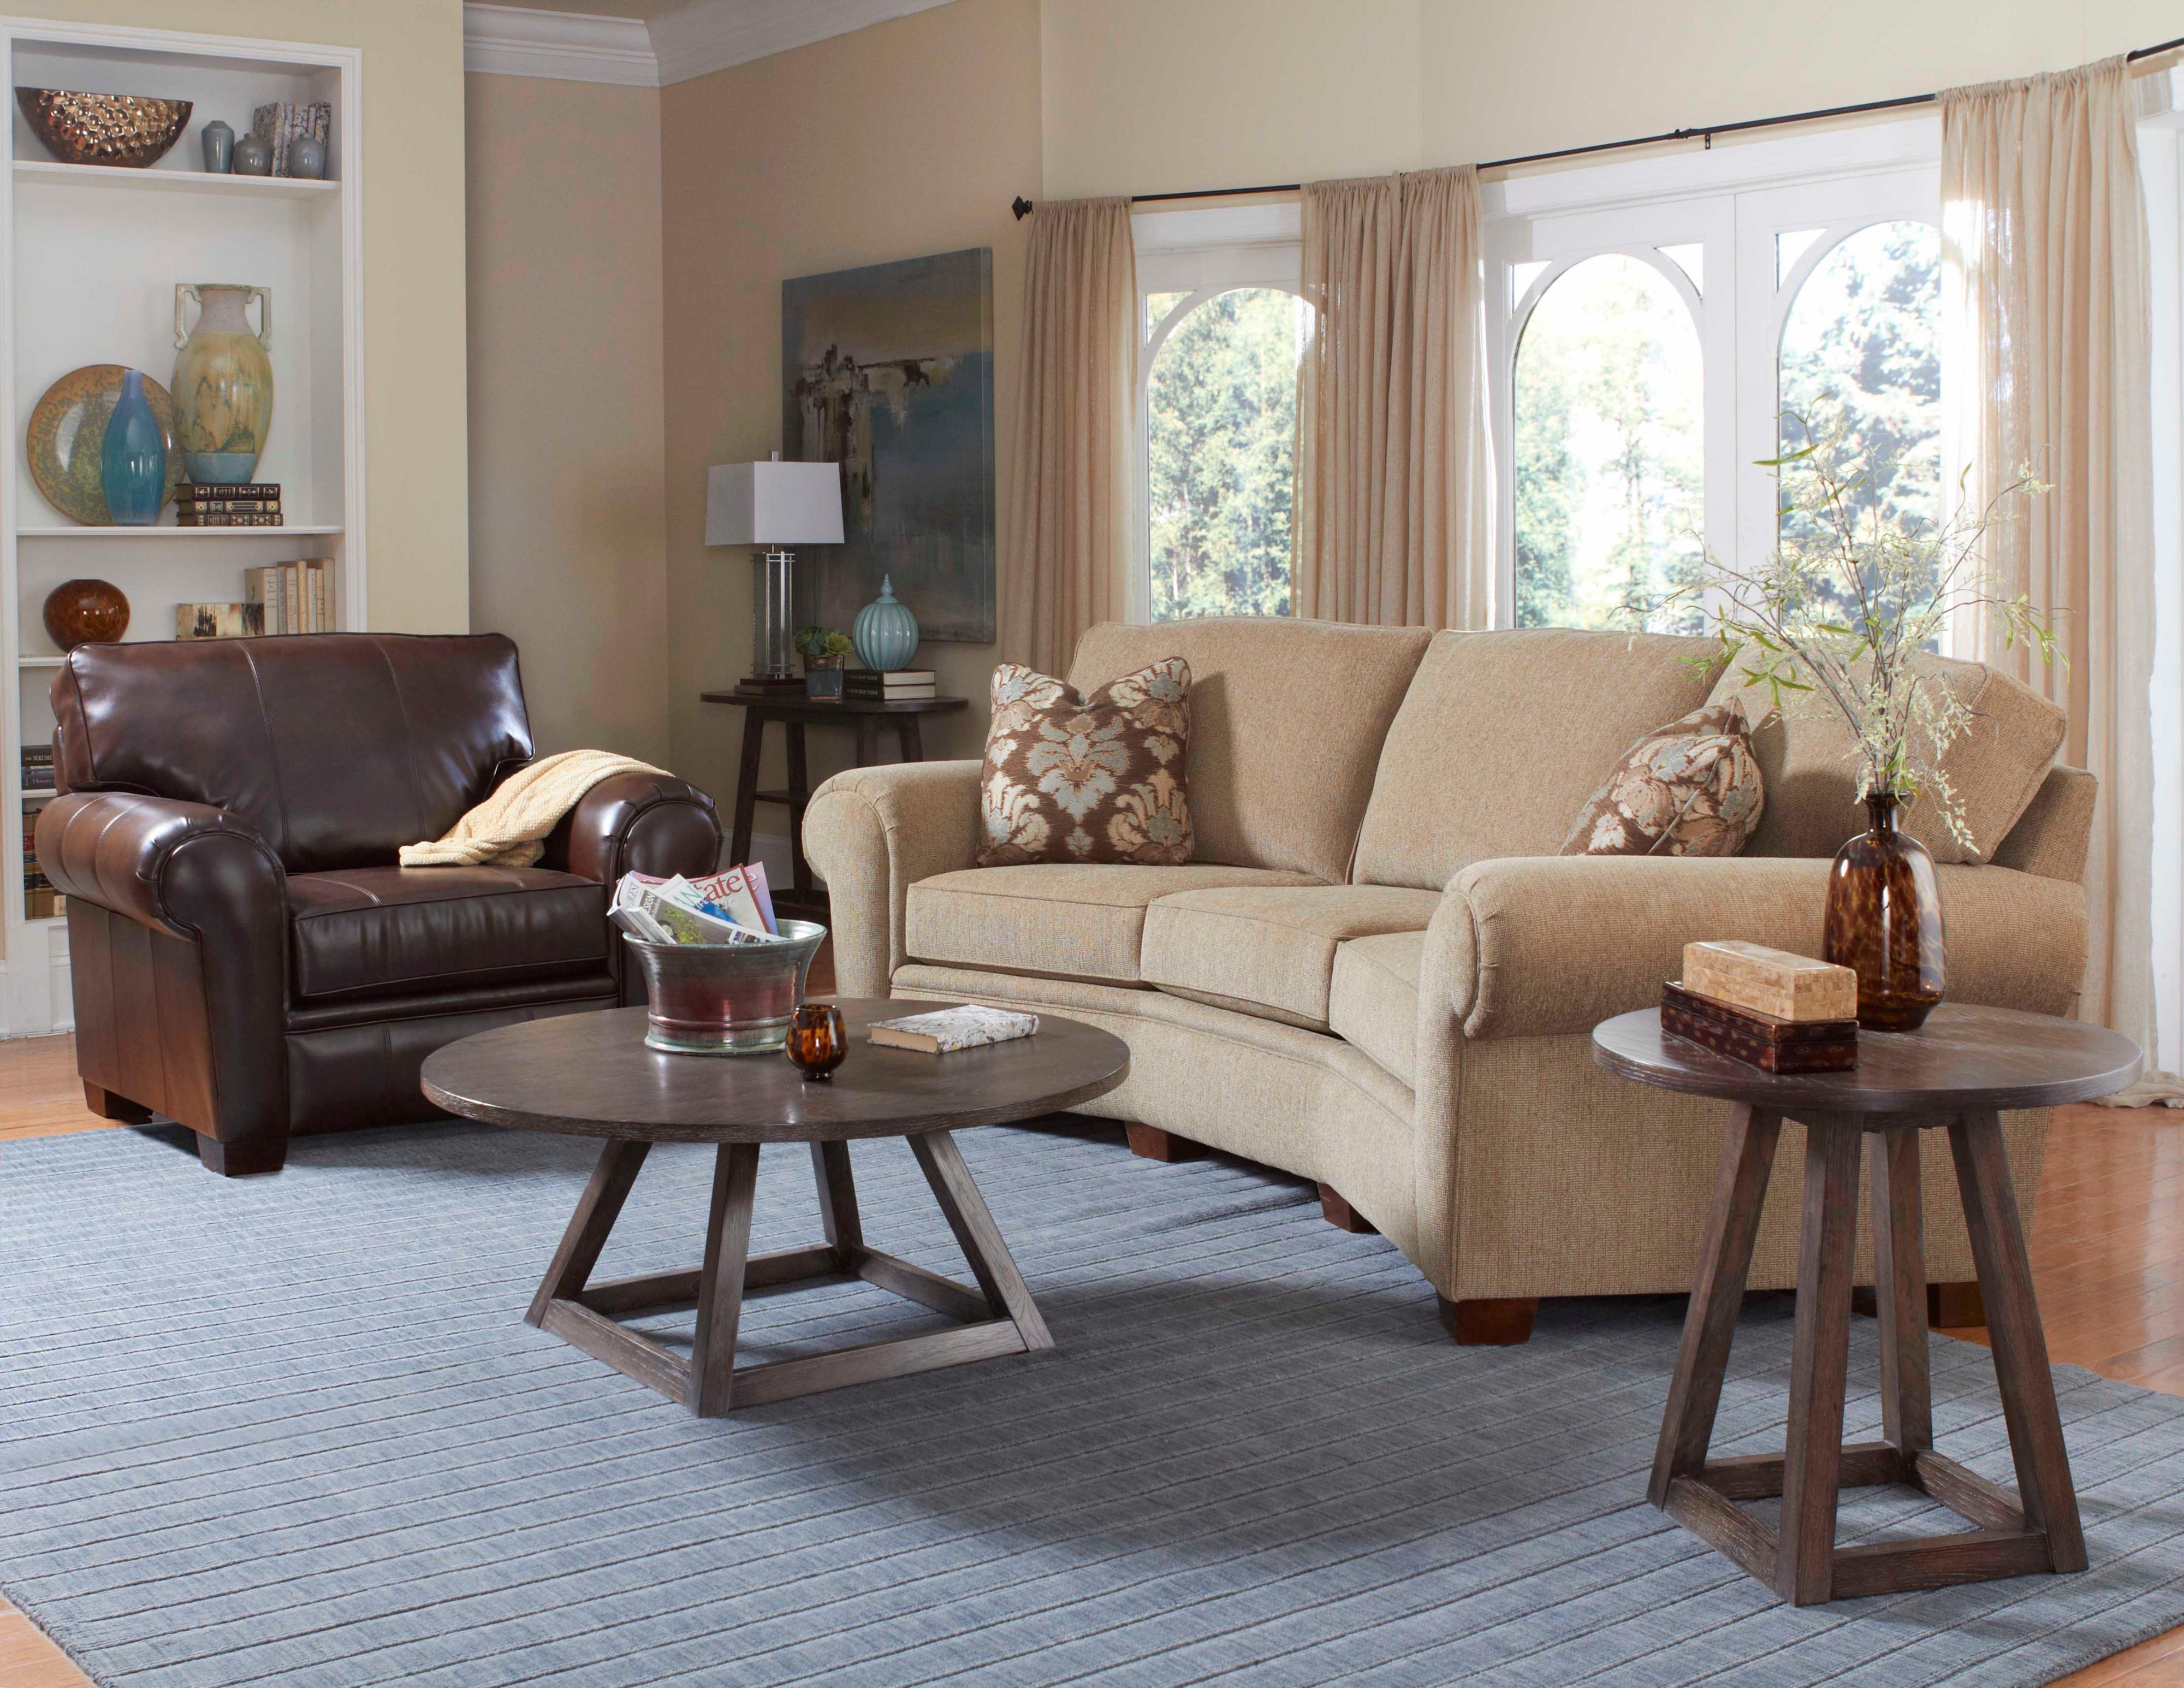 Broyhill Furniture Miller Stationary Living Room Group - Item Number: 5300 Living Room Group 1